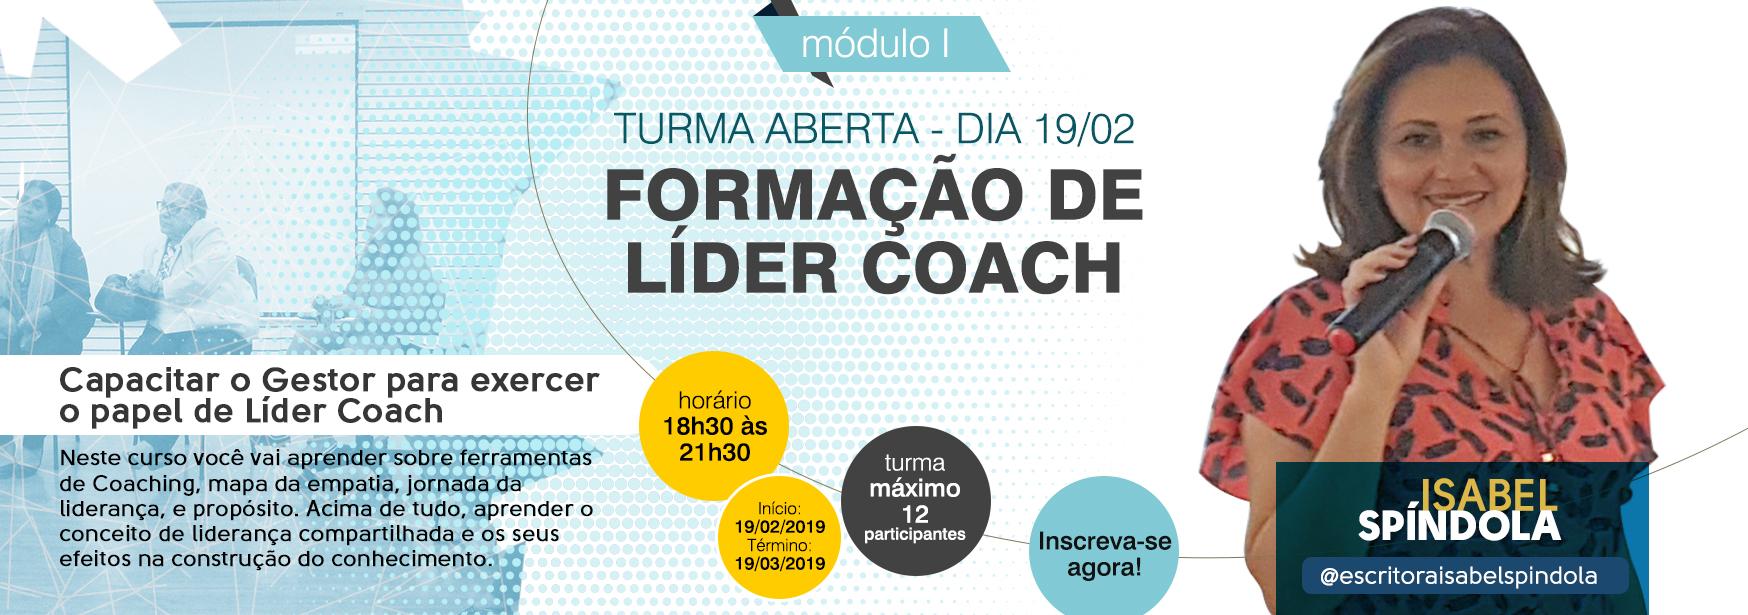 Destaque_Site_Formacao_Lider_Coach